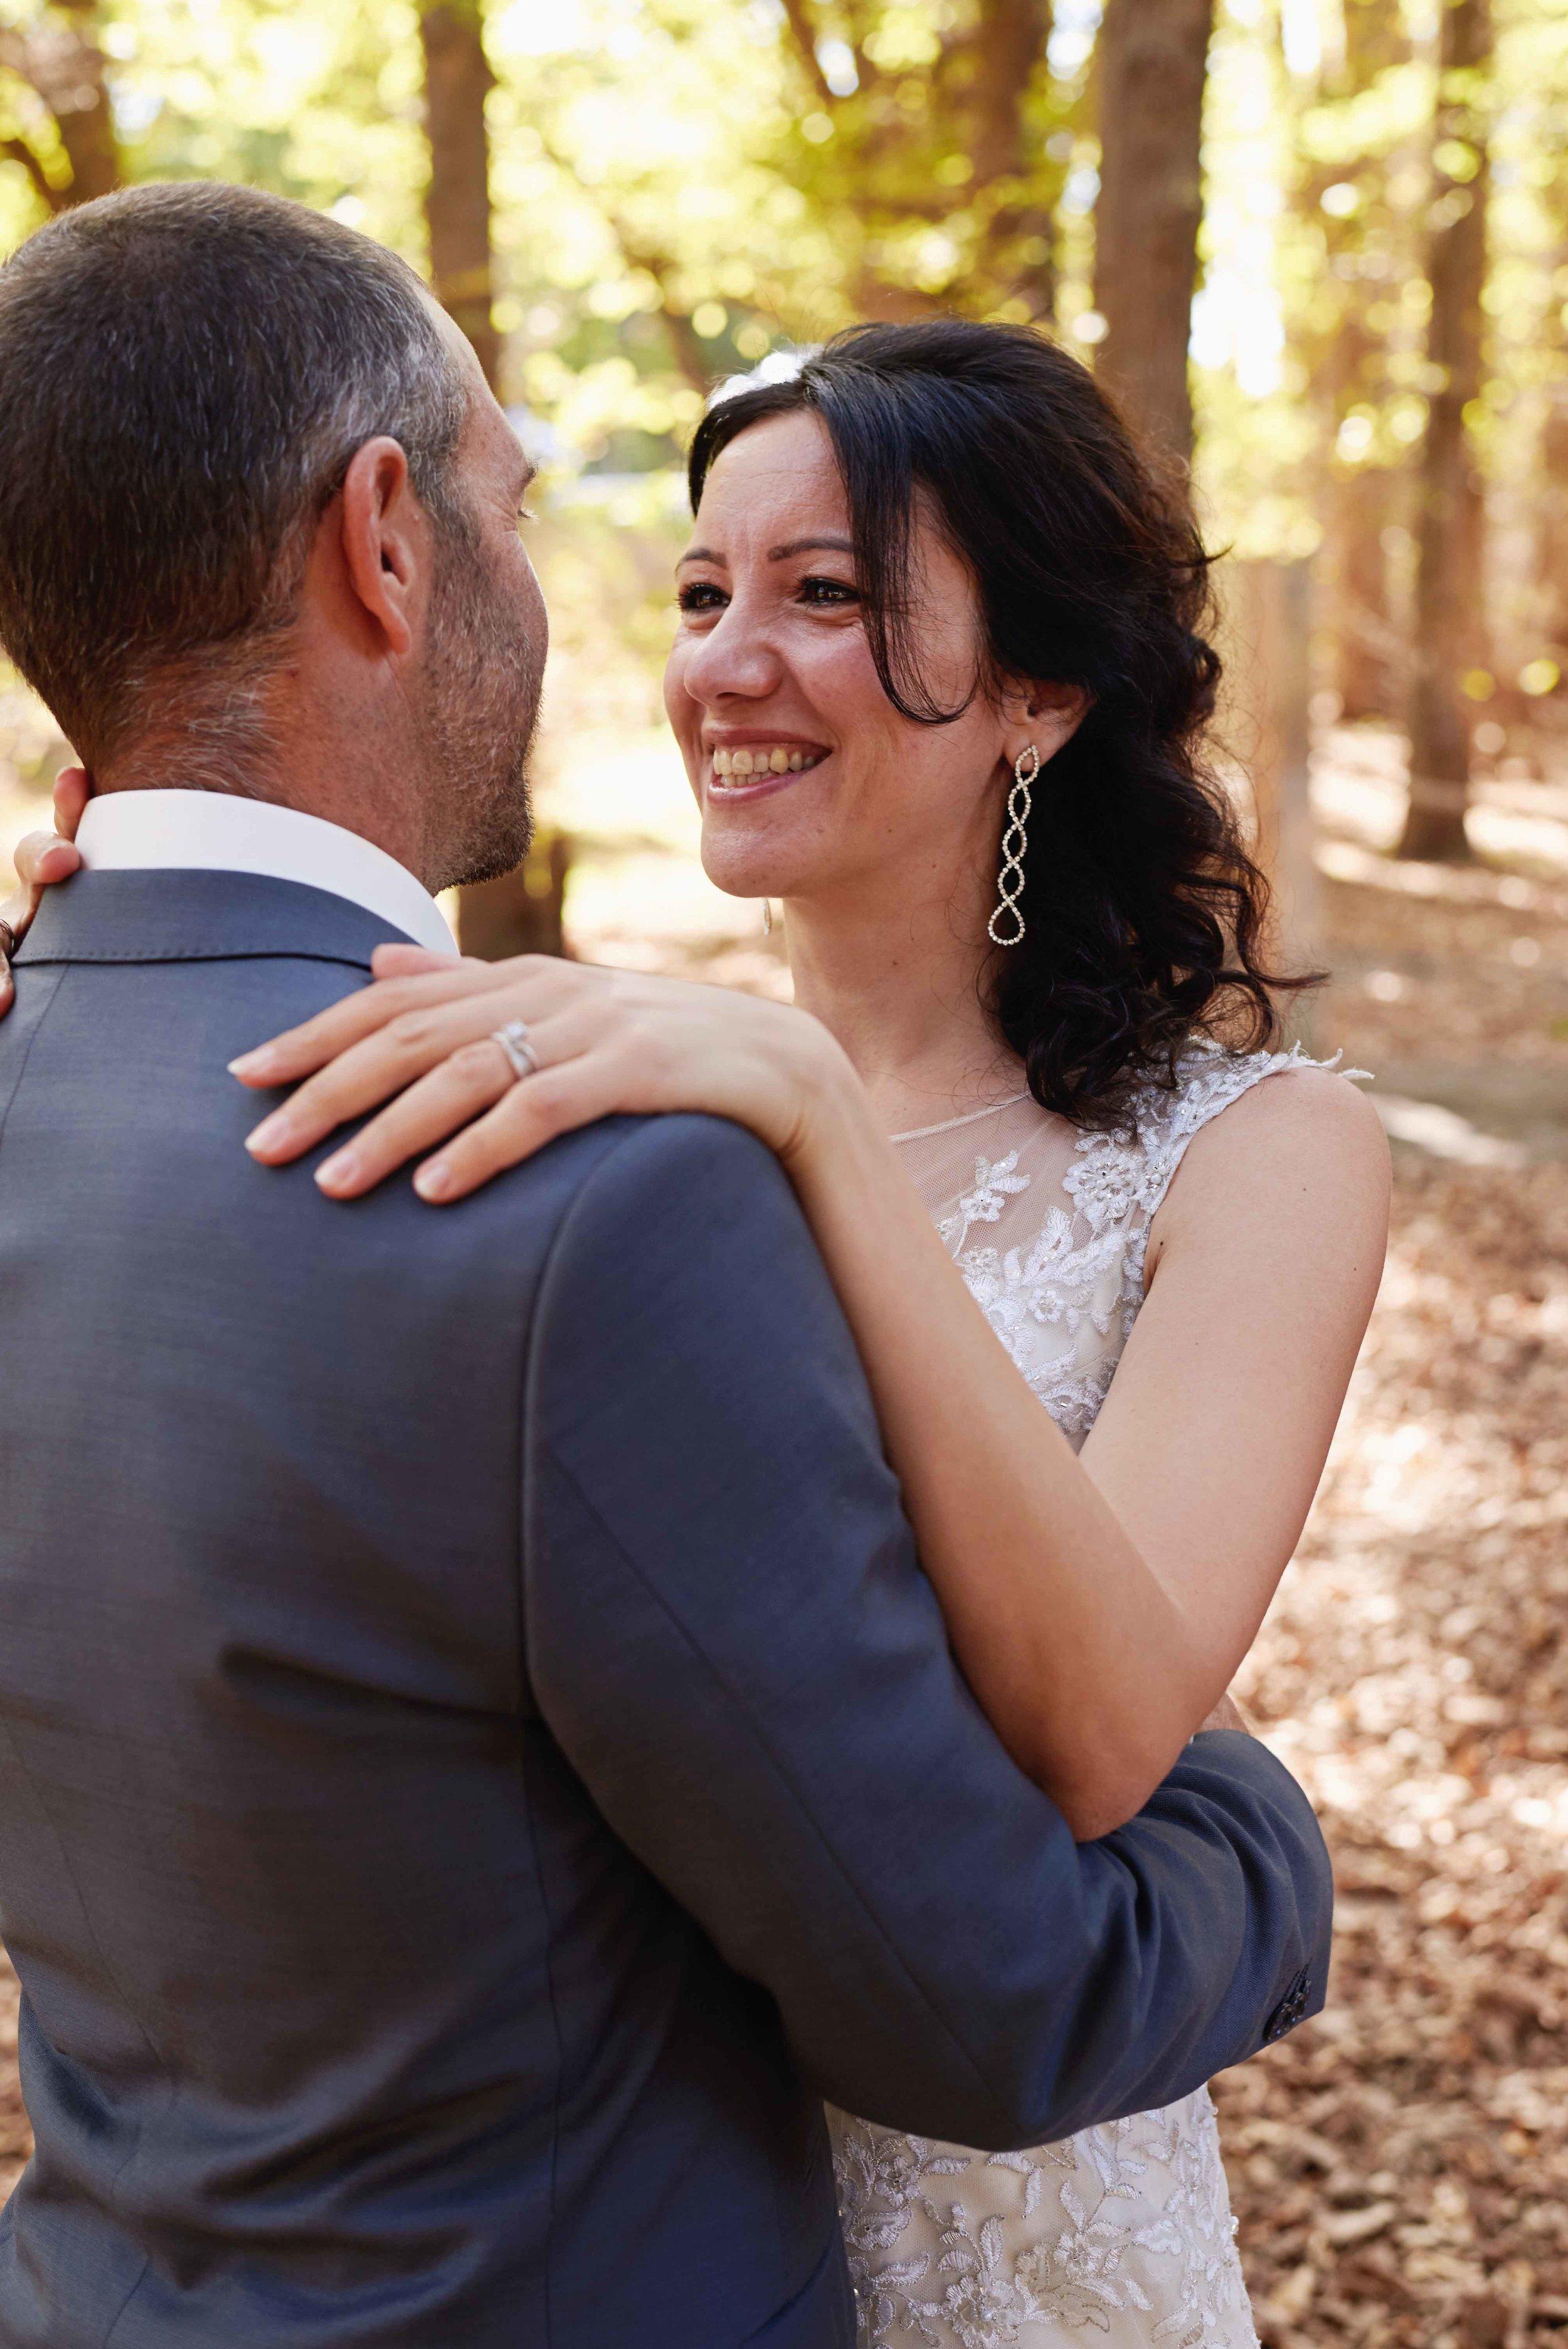 sorrento-wedding-photography-all-smiles-marissa-jade-photography-144.jpg